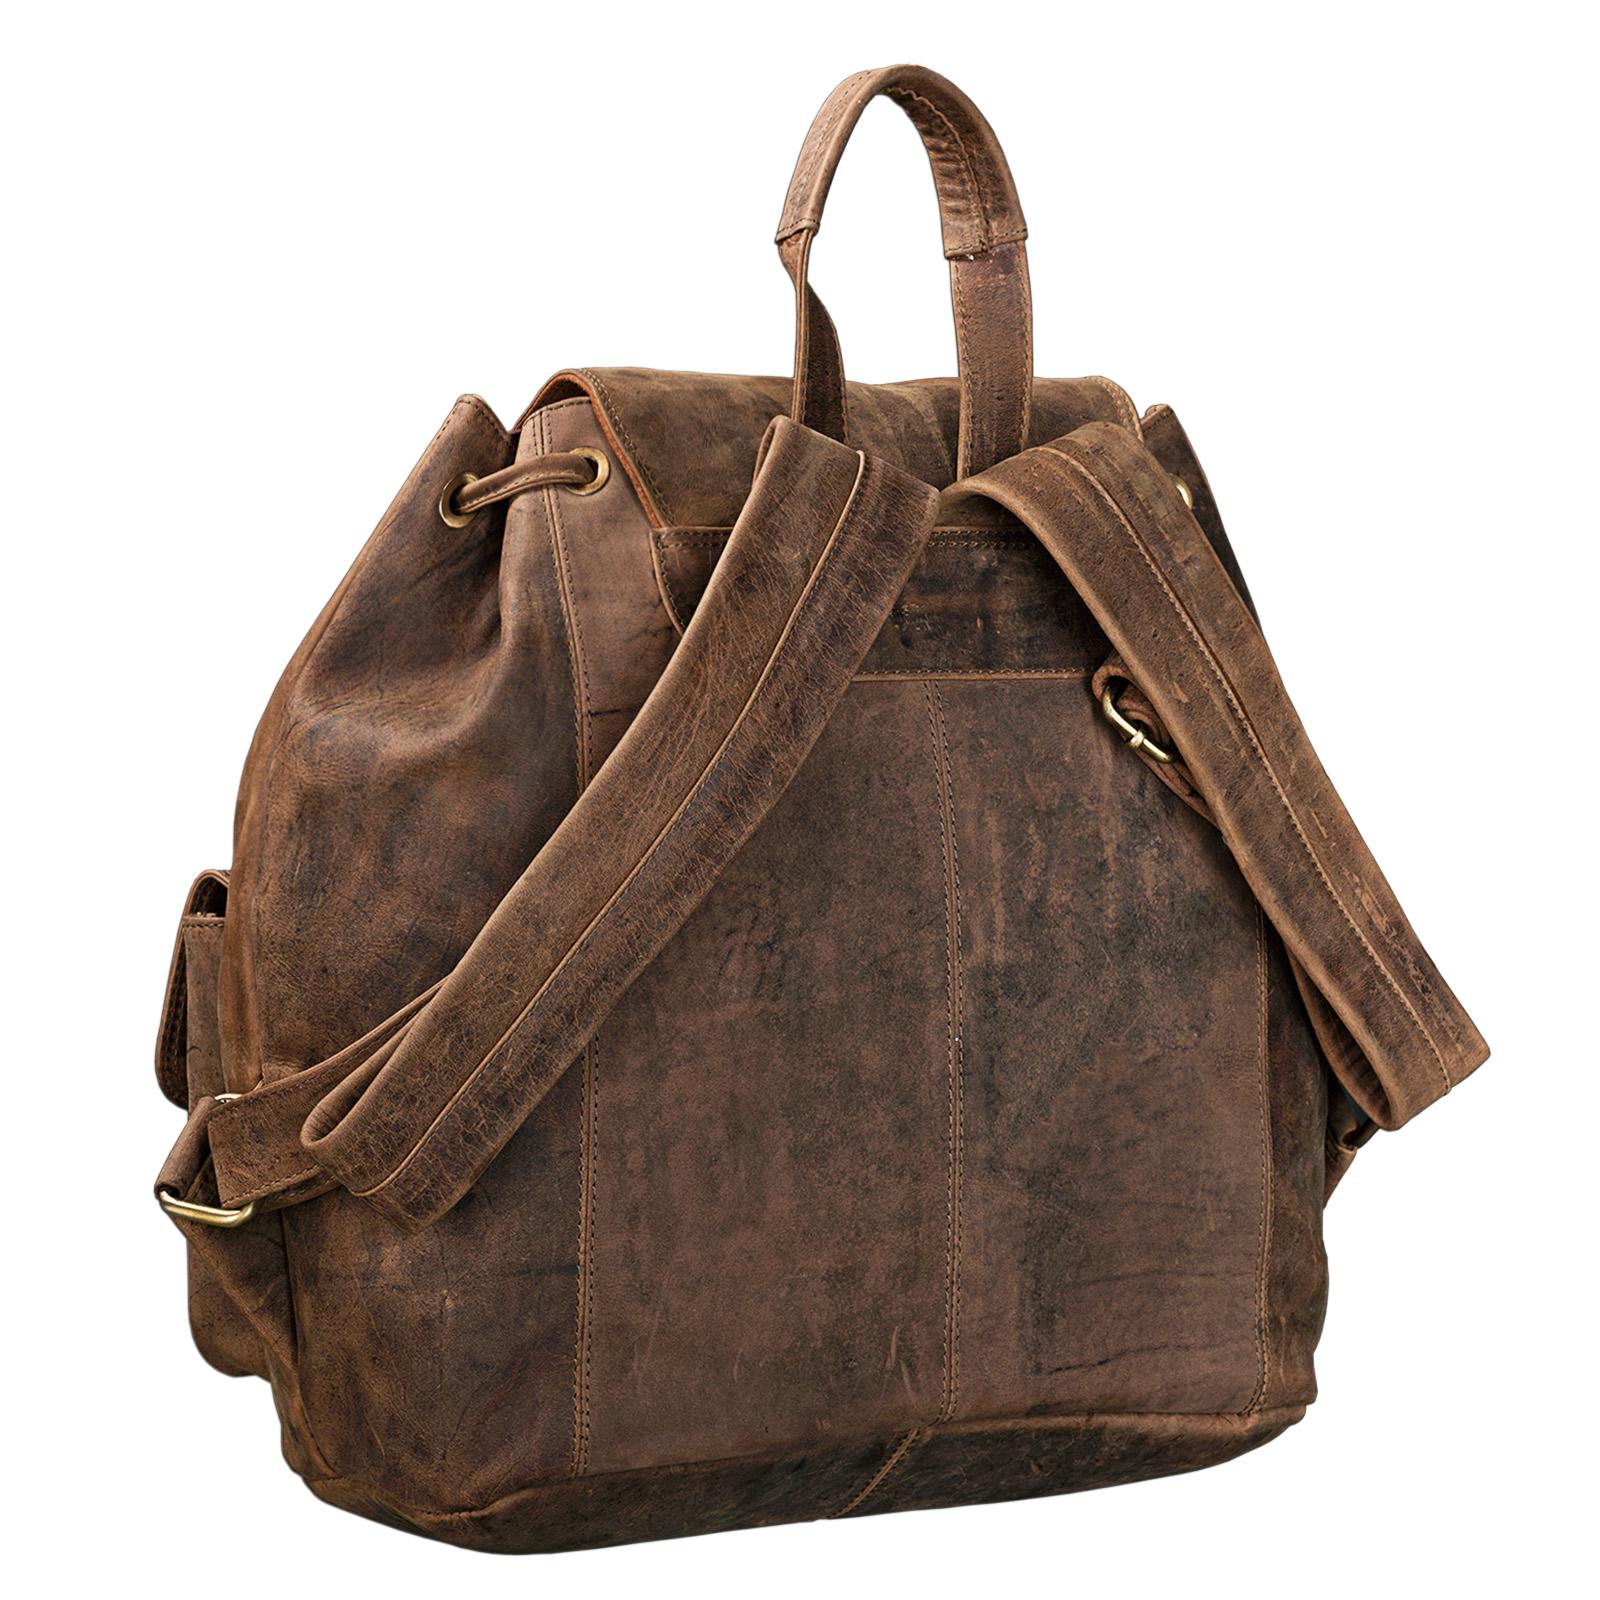 "STILORD ""Larissa"" Vintage Rucksack Leder Damen Rucksackhandtasche Lederrucksack Handtasche DIN A4 City Shopping Daypack Schule Uni - Bild 12"